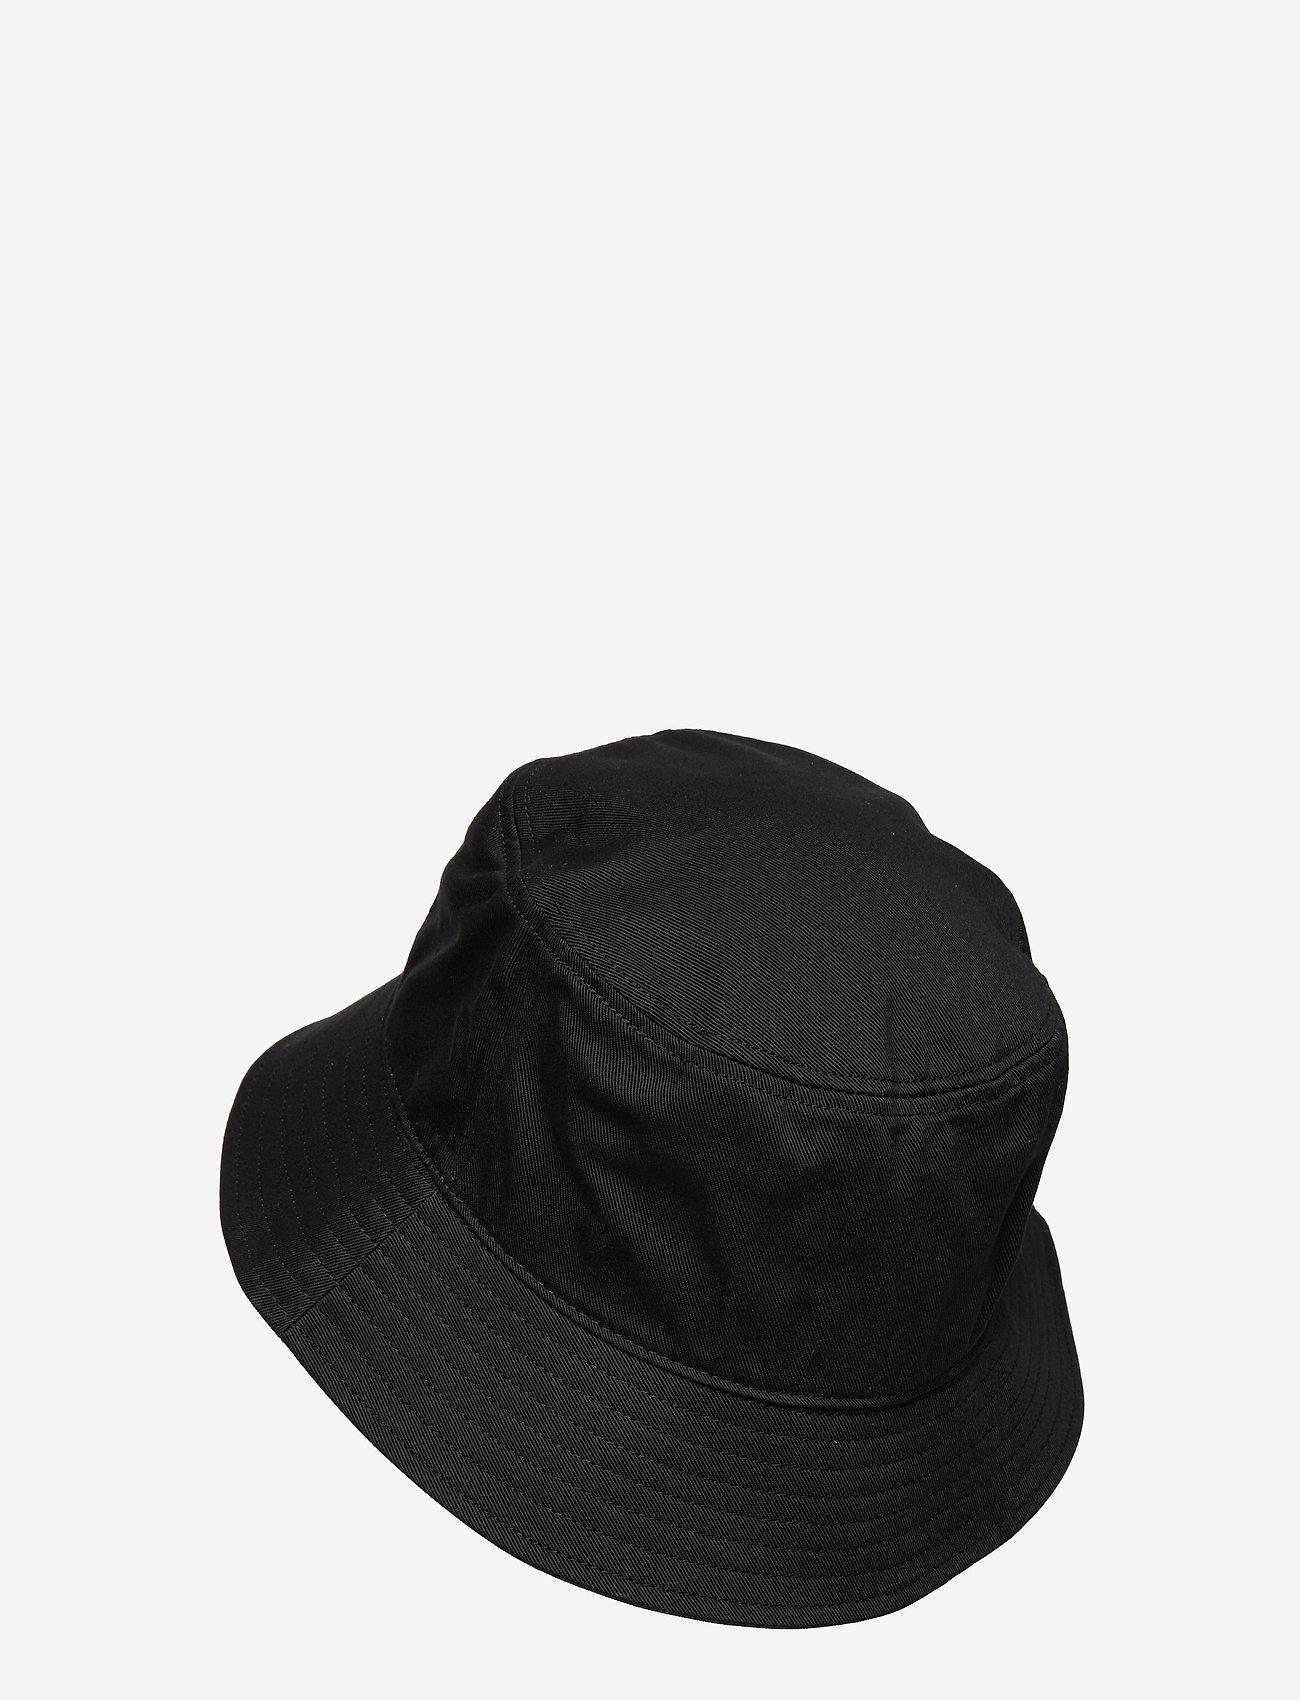 Calvin Klein - BUCKET HAT - bucket hats - ck black - 1